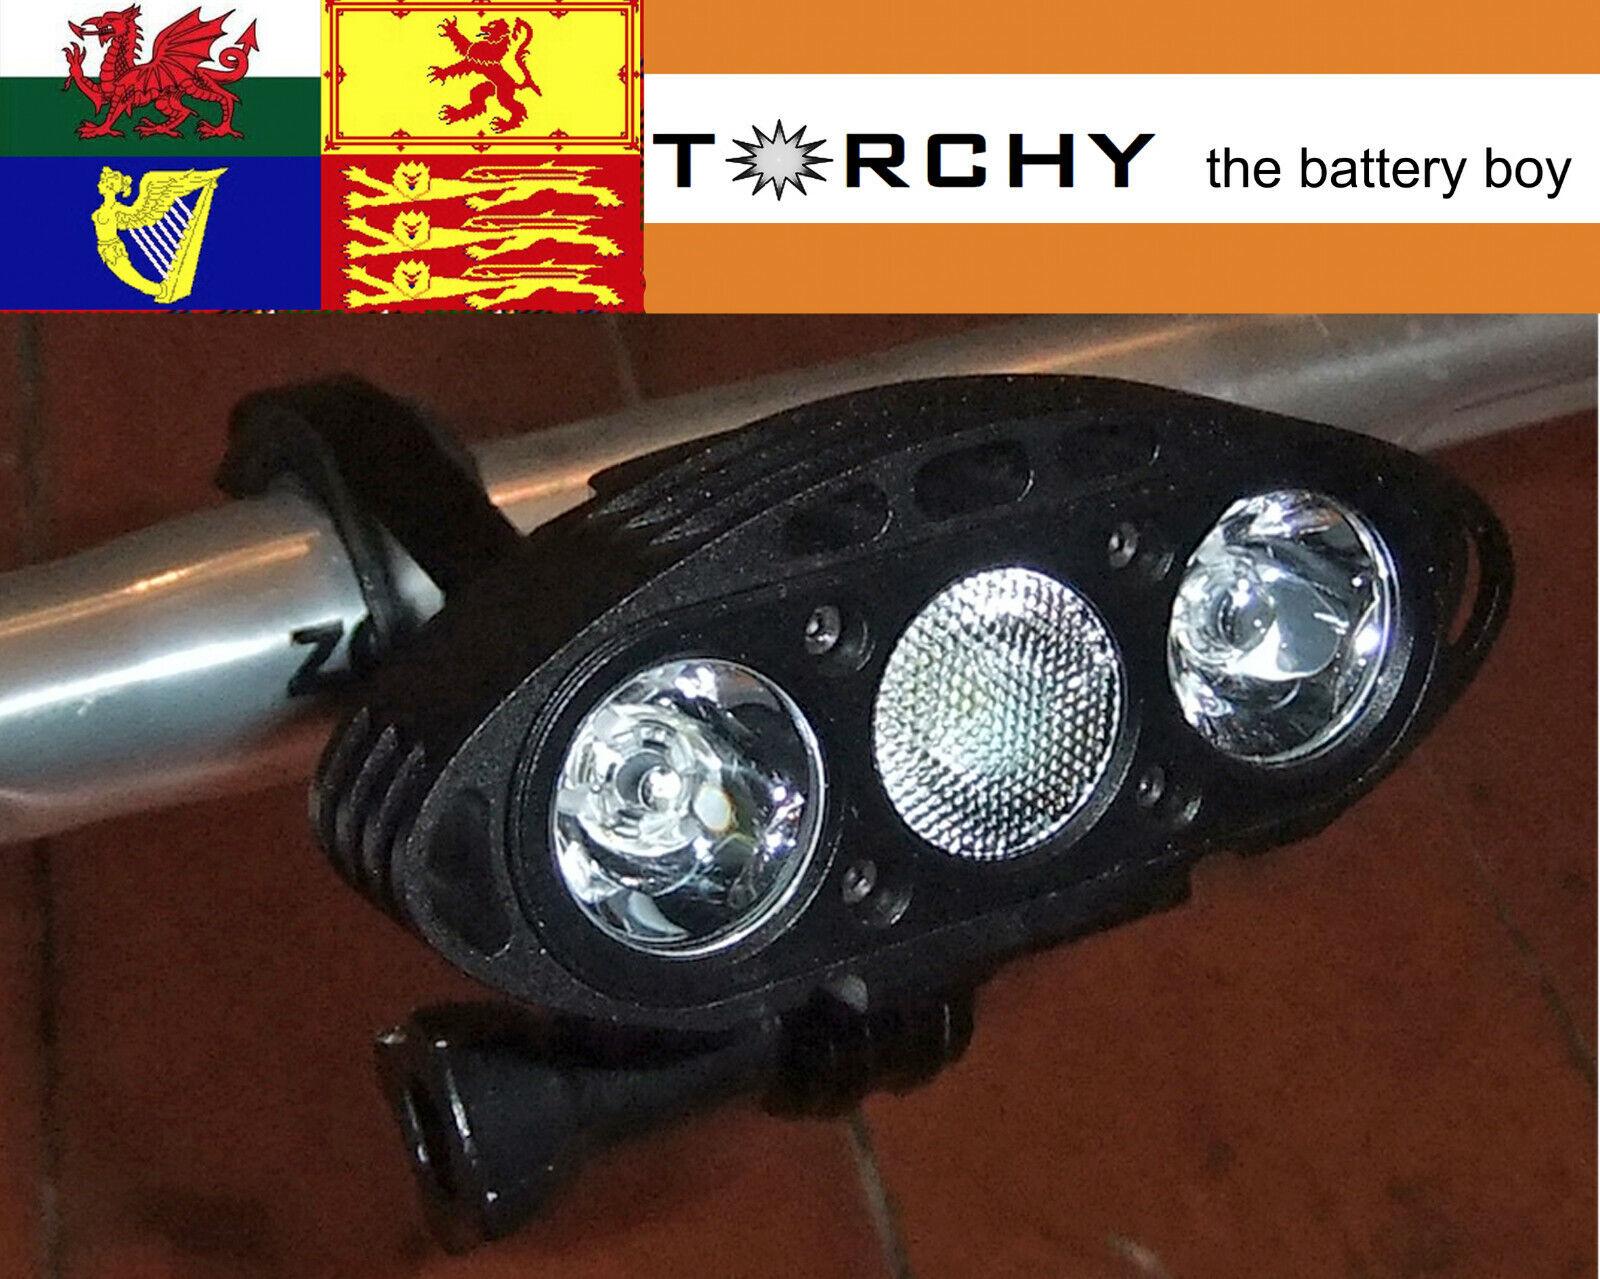 M-Tigersports THEIA Endurance 3000 lumen bike and head light,O ring +solid mount